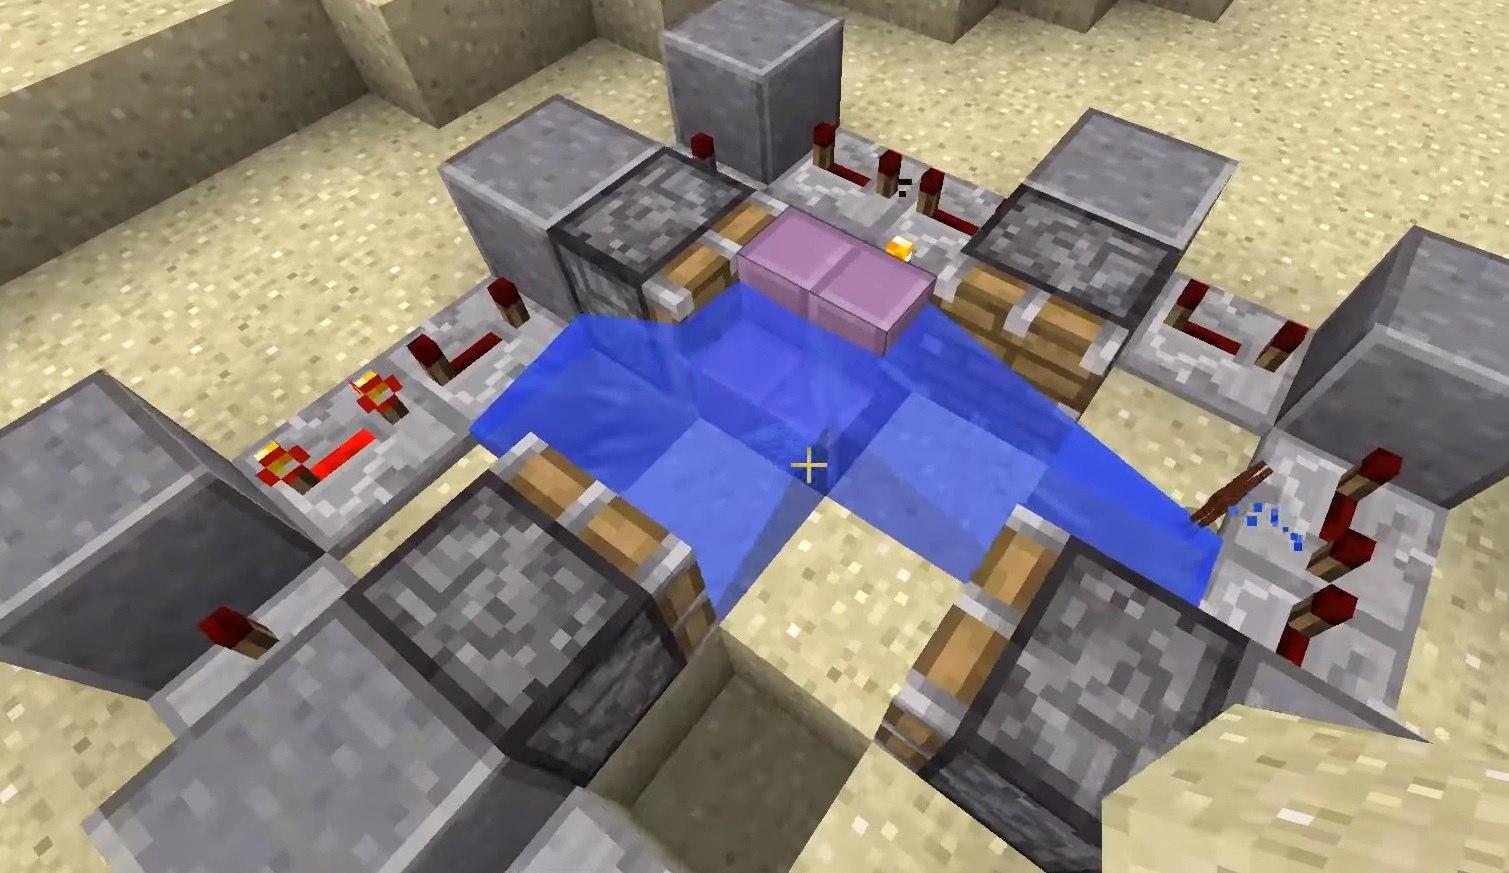 fizyka wody bloki minecraft 1.13 img 3